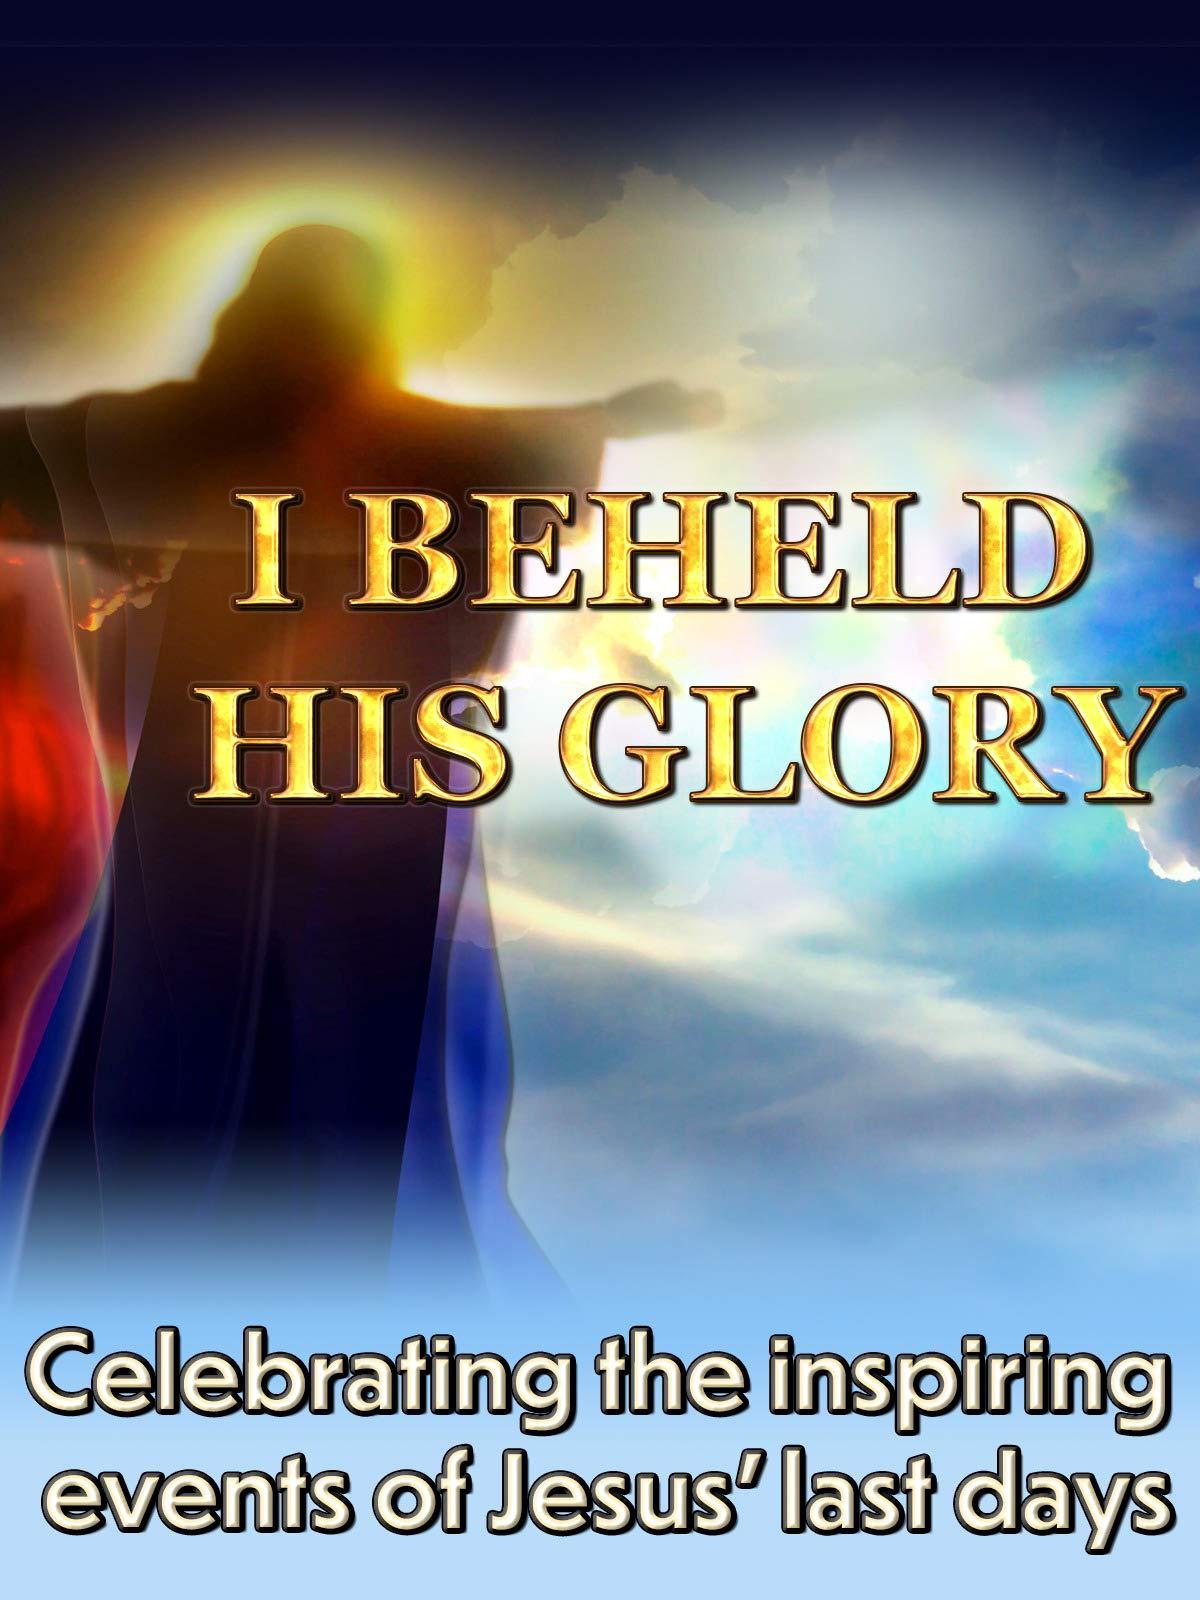 I Beheld His Glory - Celebrating the inspiring events of Jesus' last days